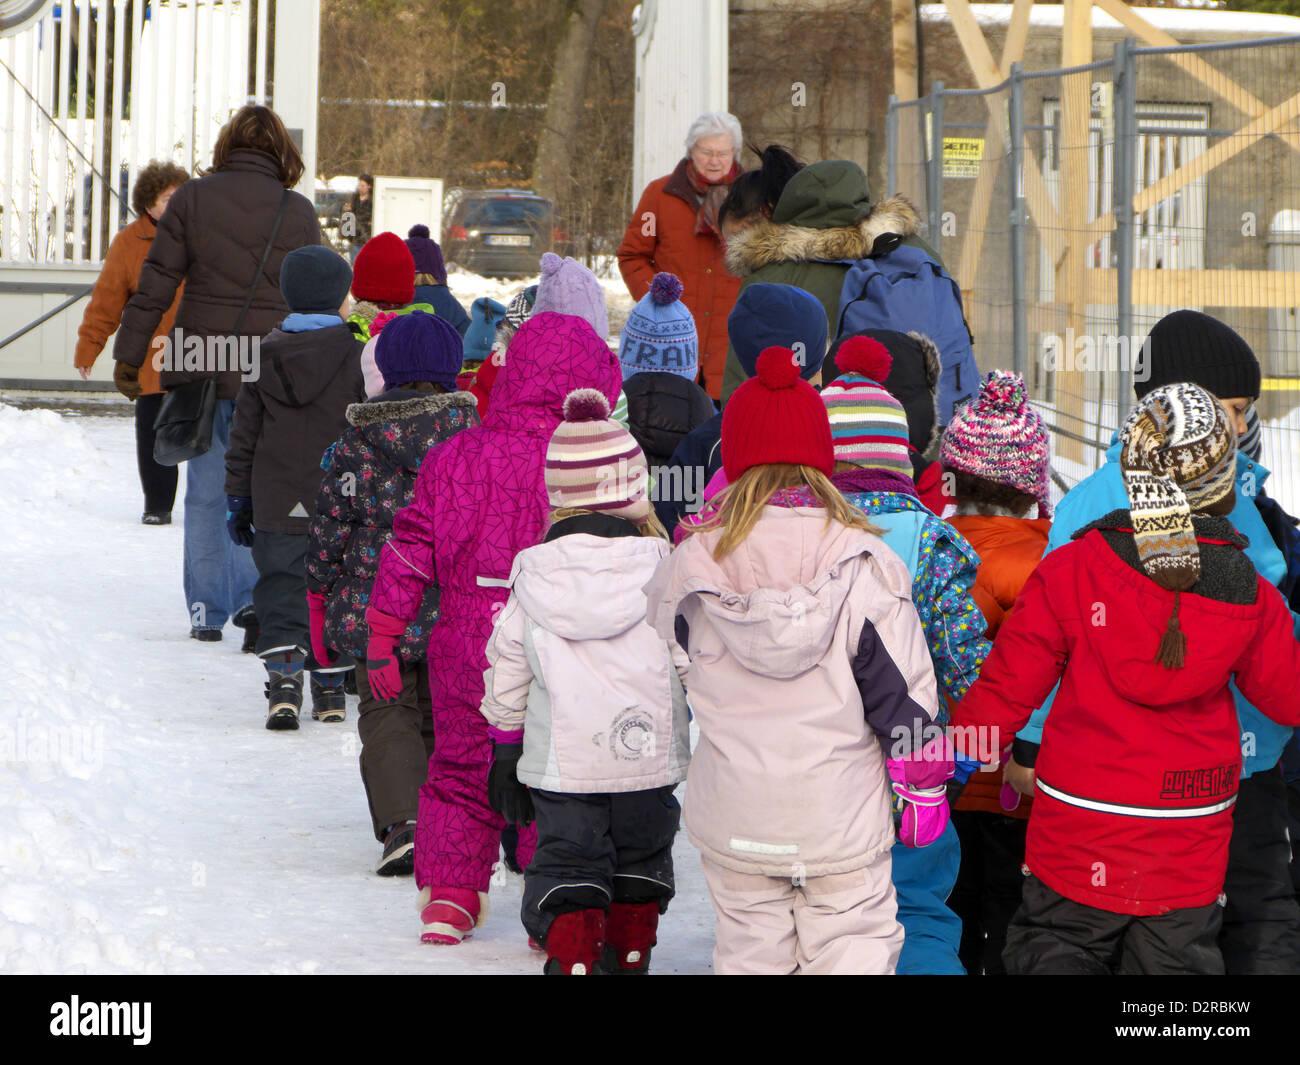 Kindergarten kids having a tour outing excursion - Stock Image